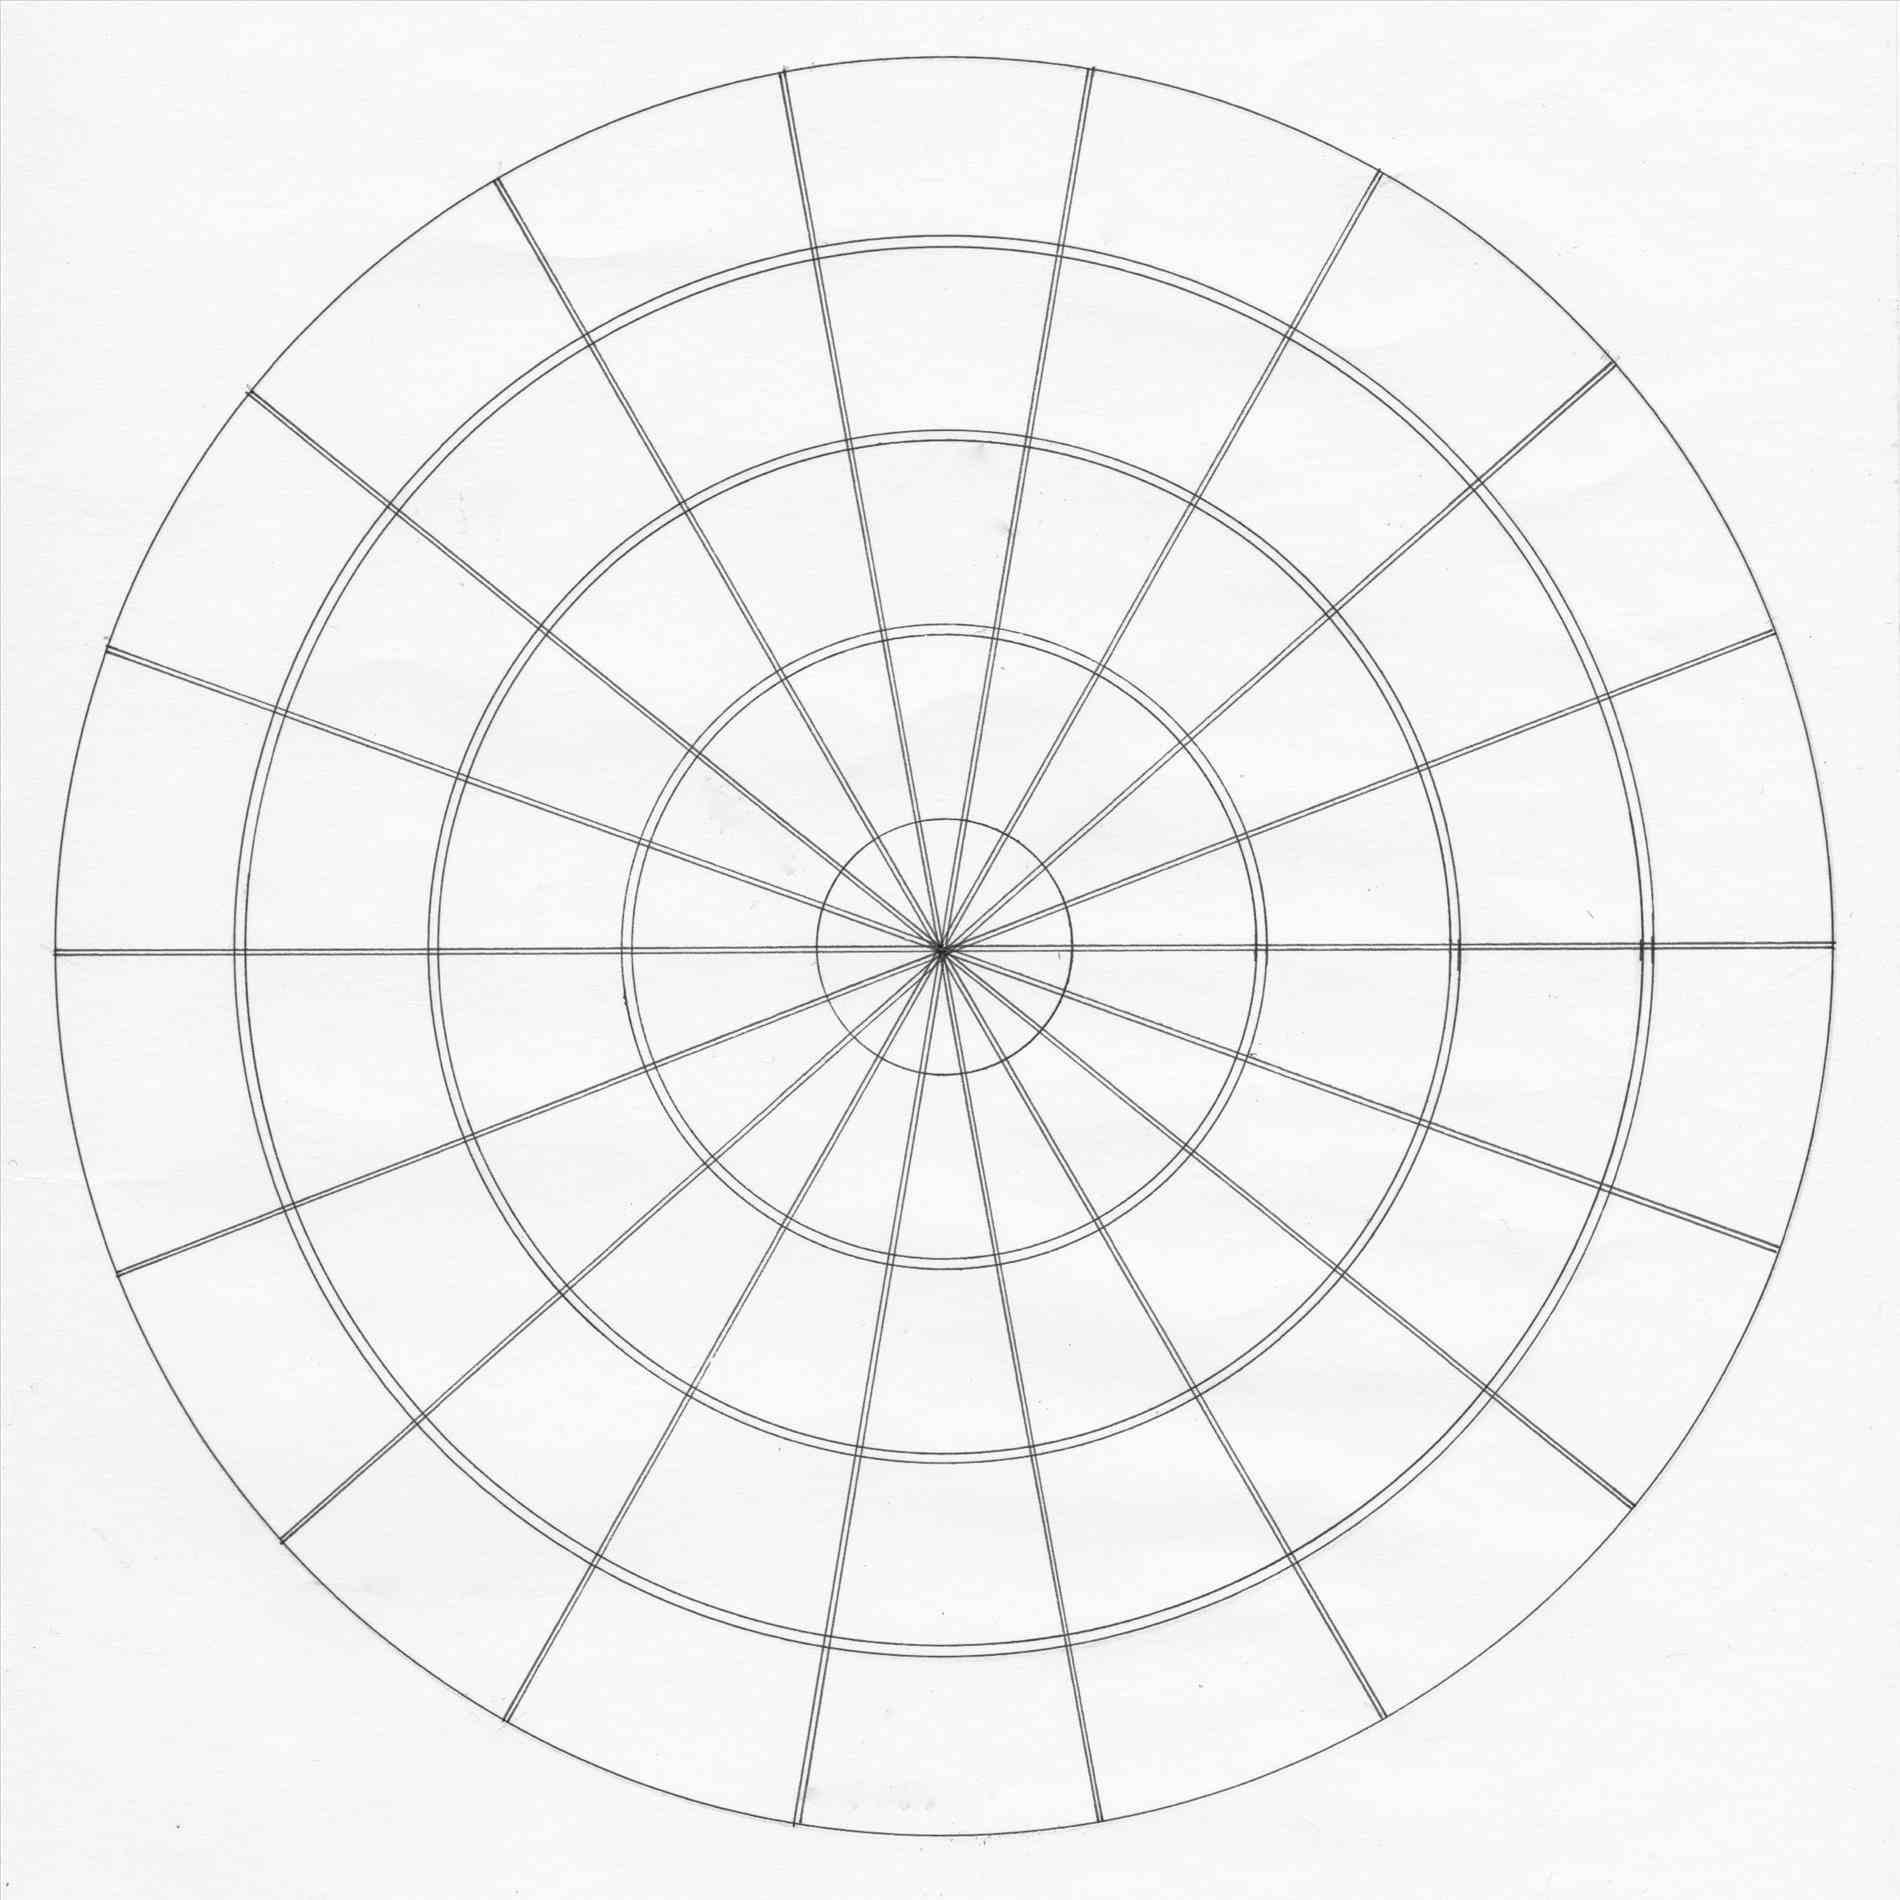 1900x1900 Infographic Selection Venngage The Color Wheel 8 Colors Dous